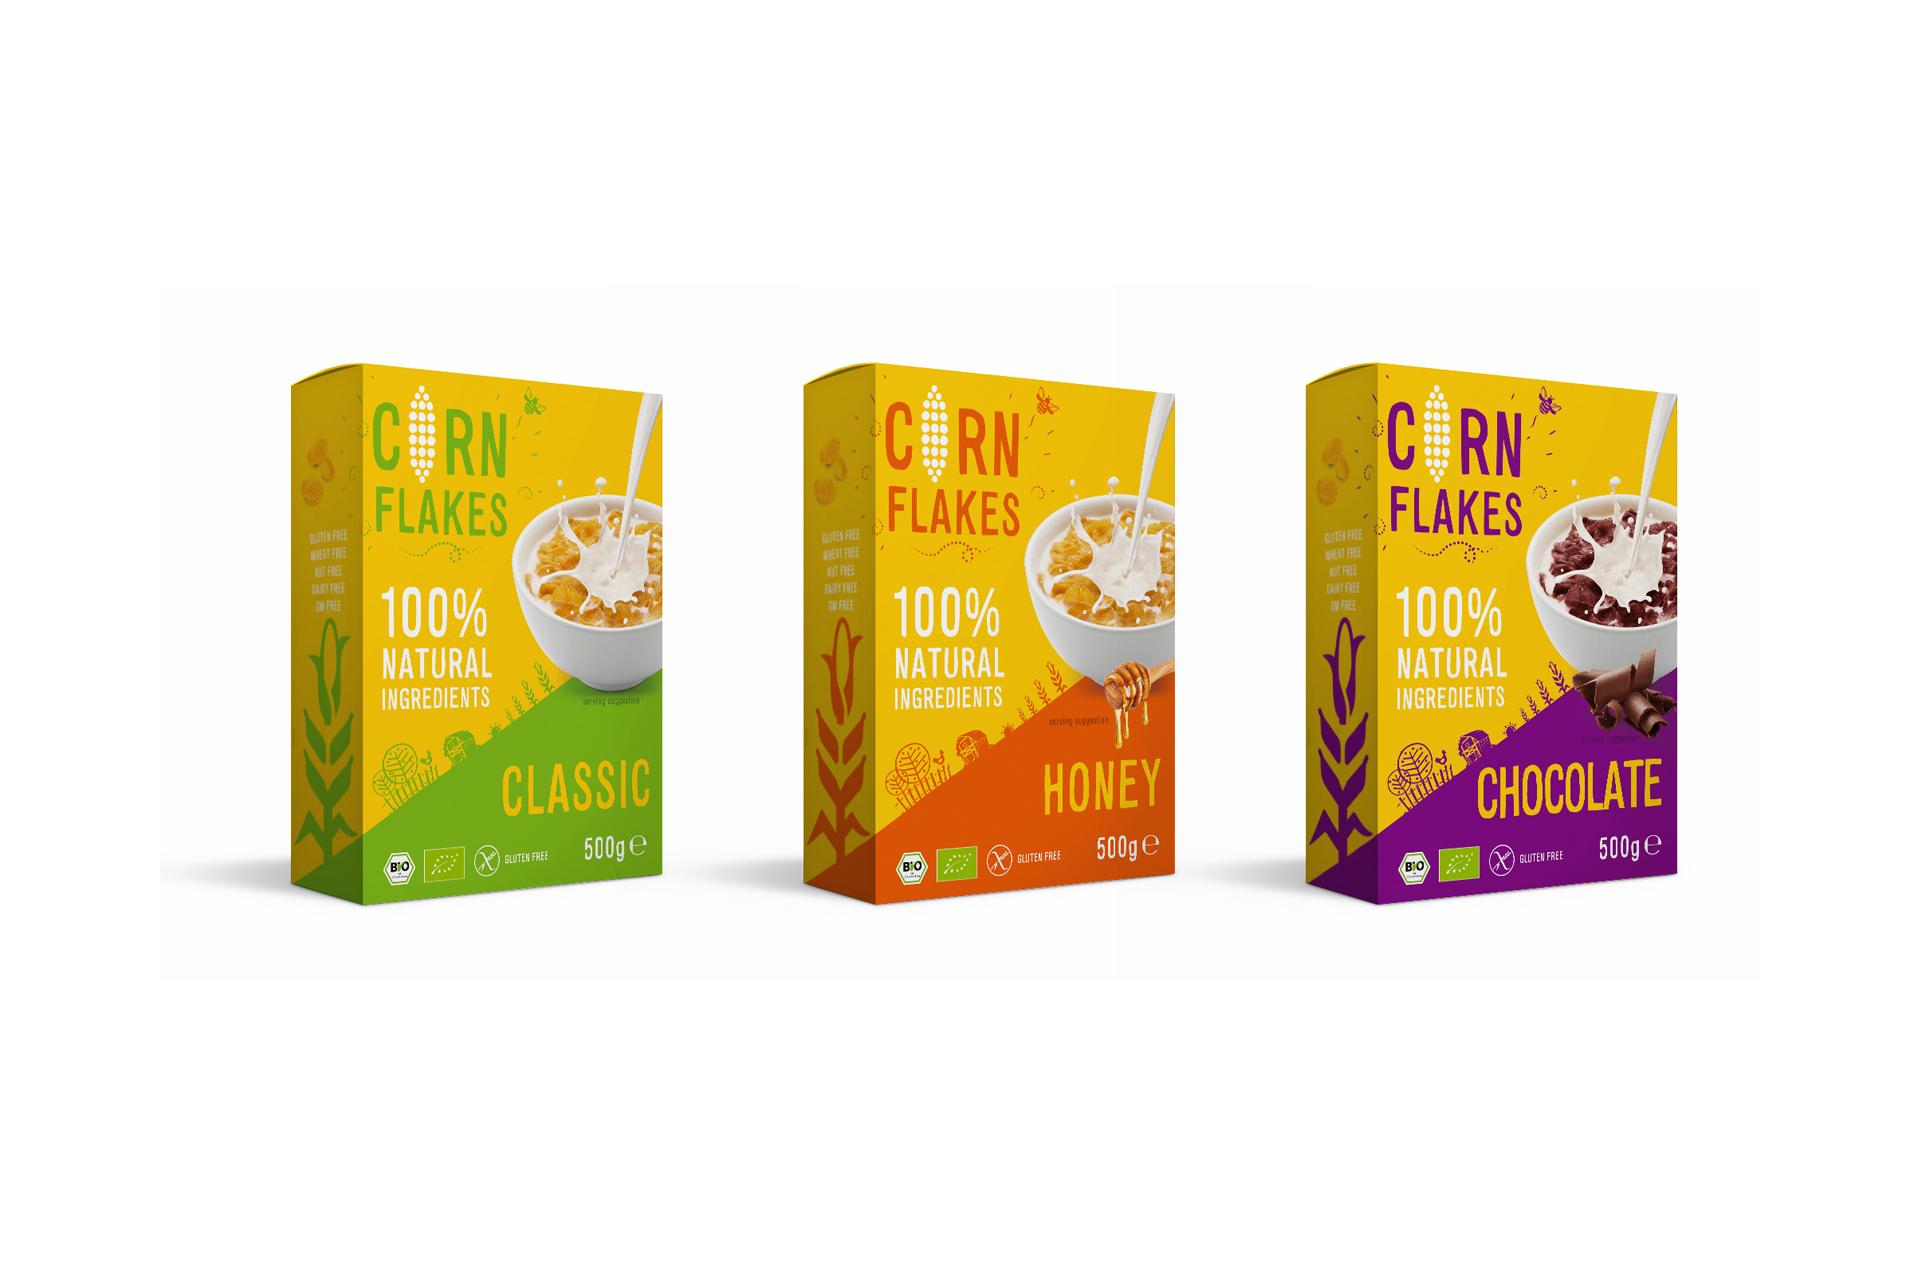 Corn Flakes Packaging Design